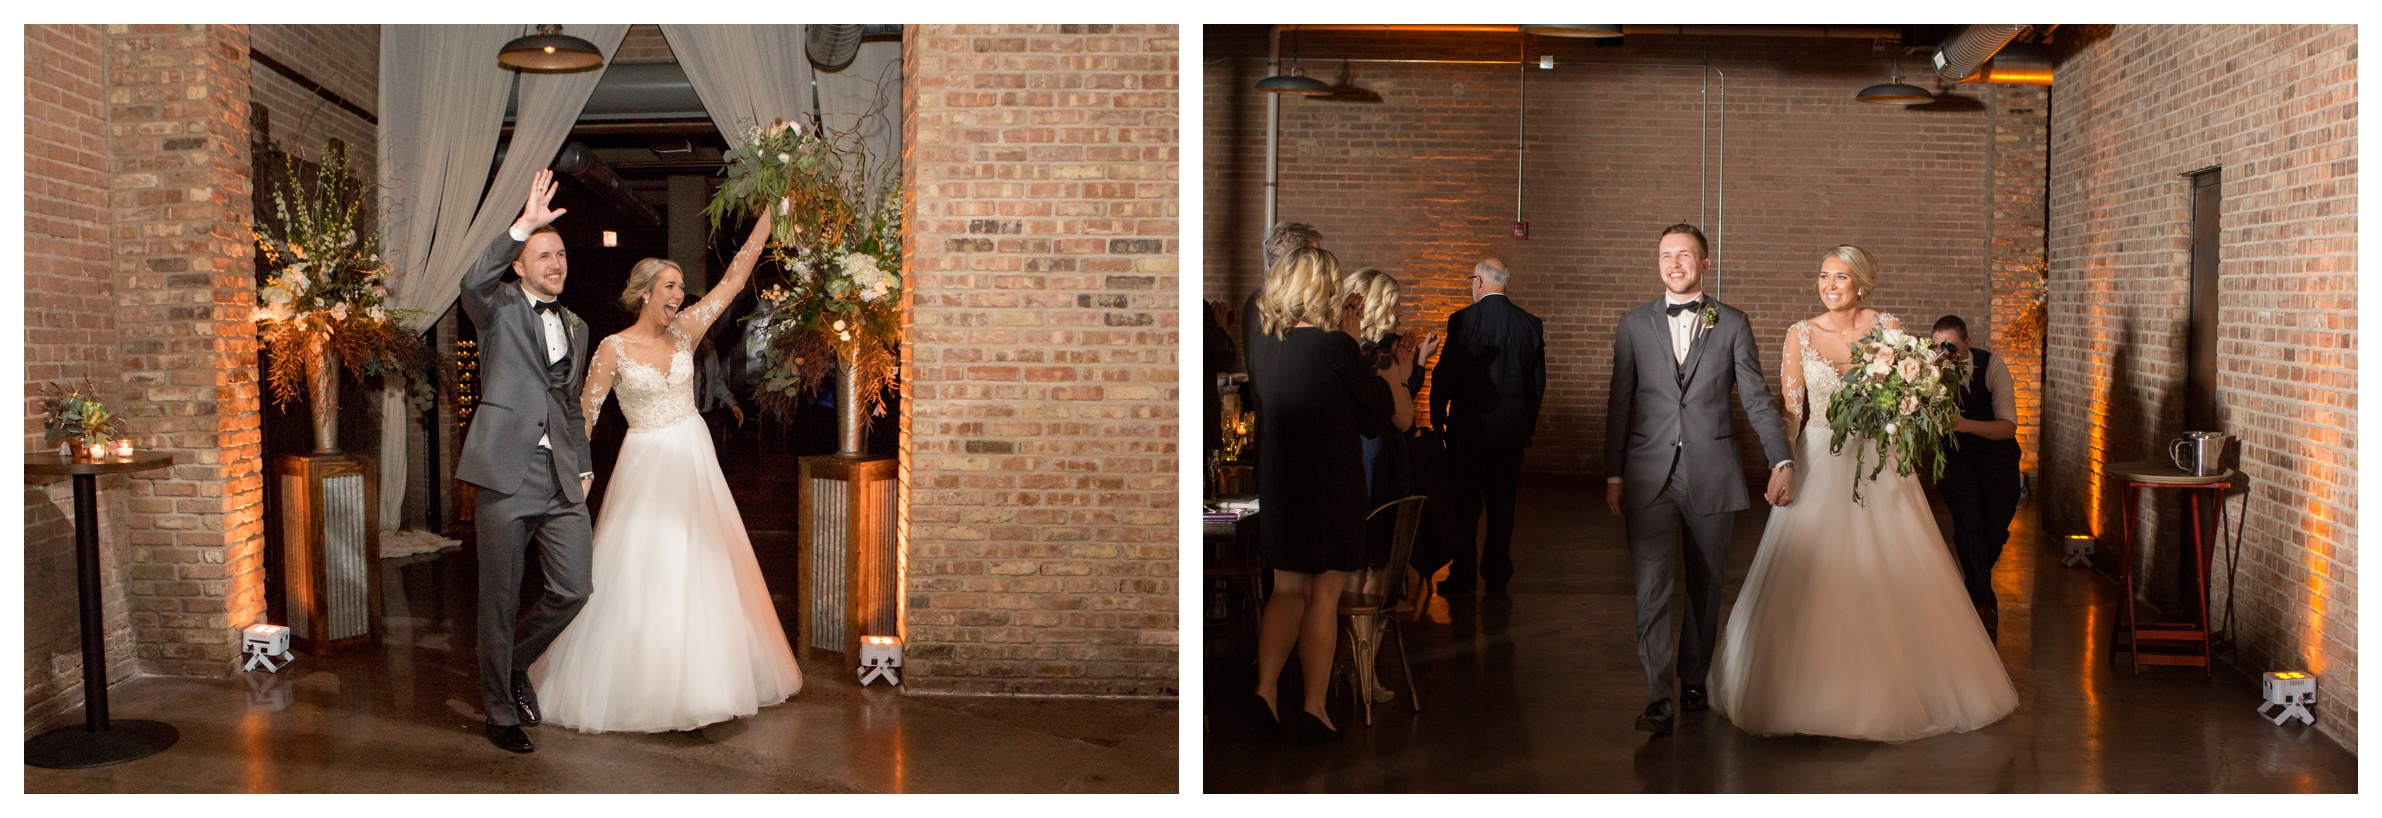 morgan-manufacturing-wedding-photos